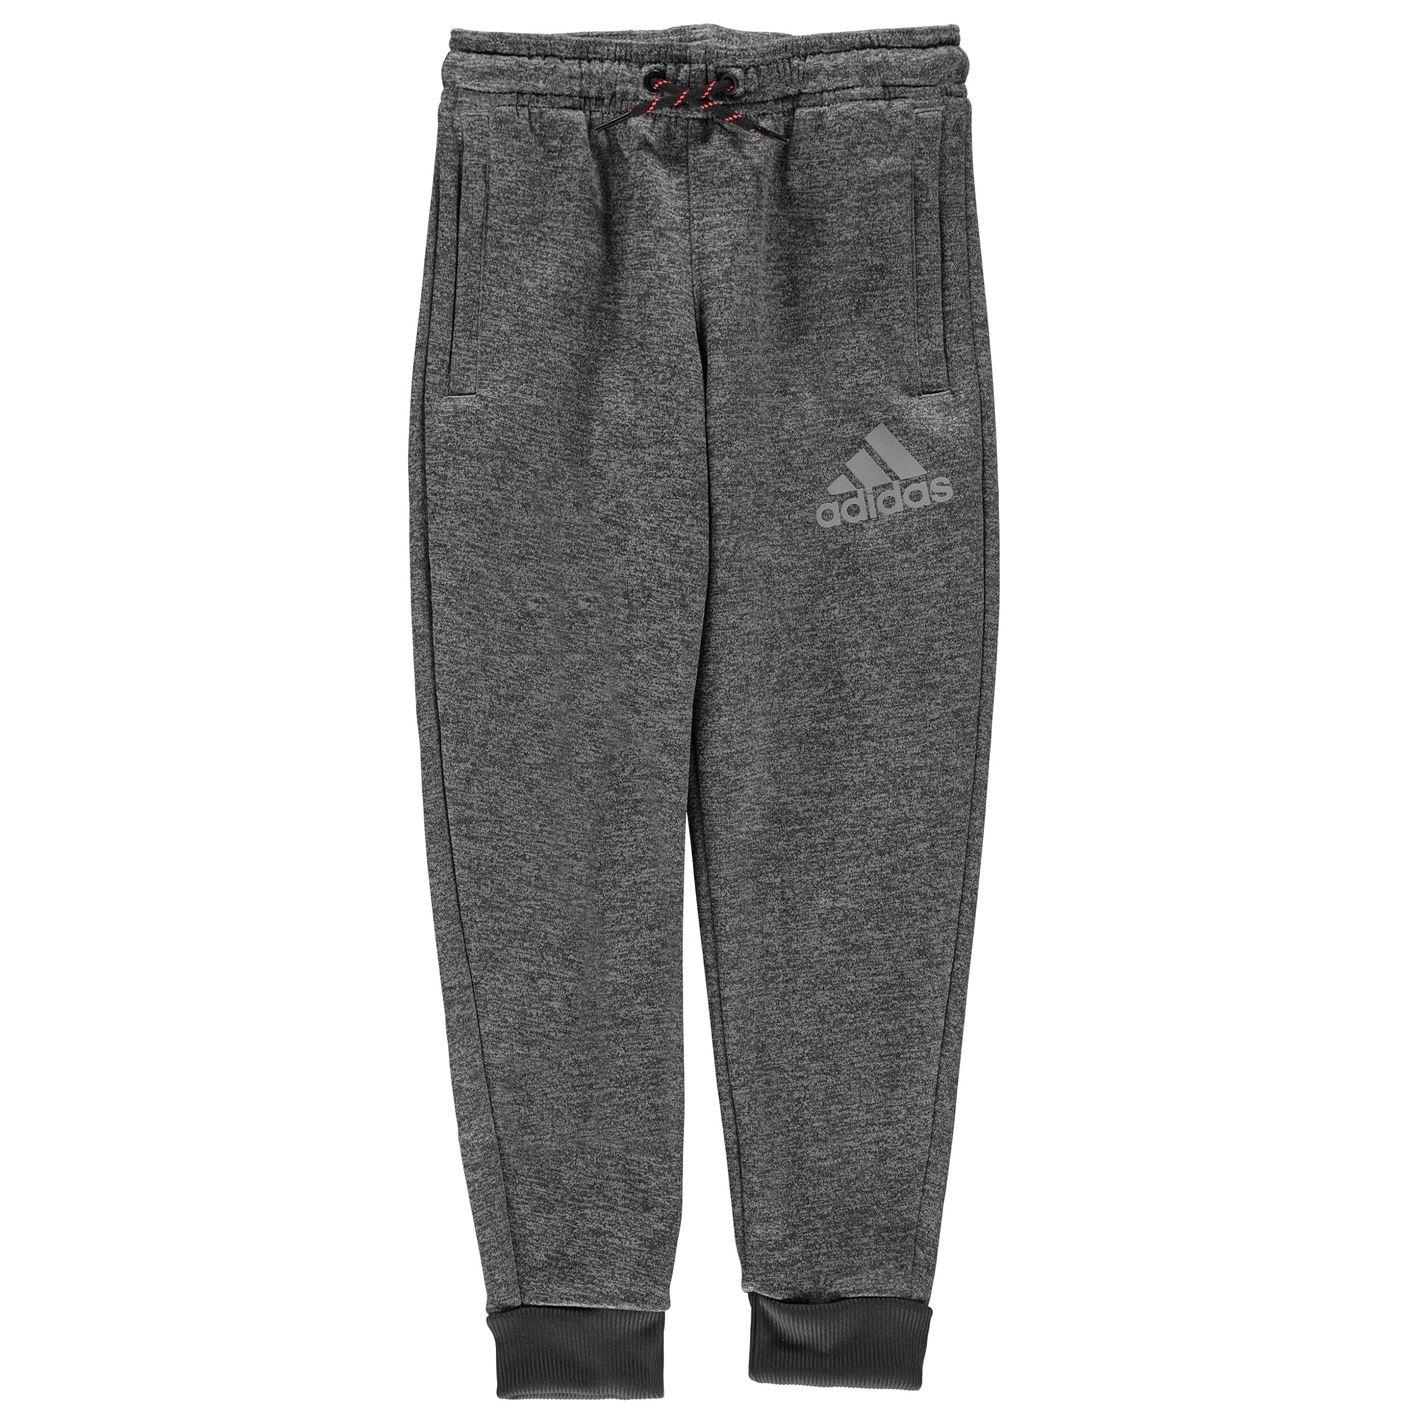 Adidas Prime Plus Fleece Pants Junior Boys